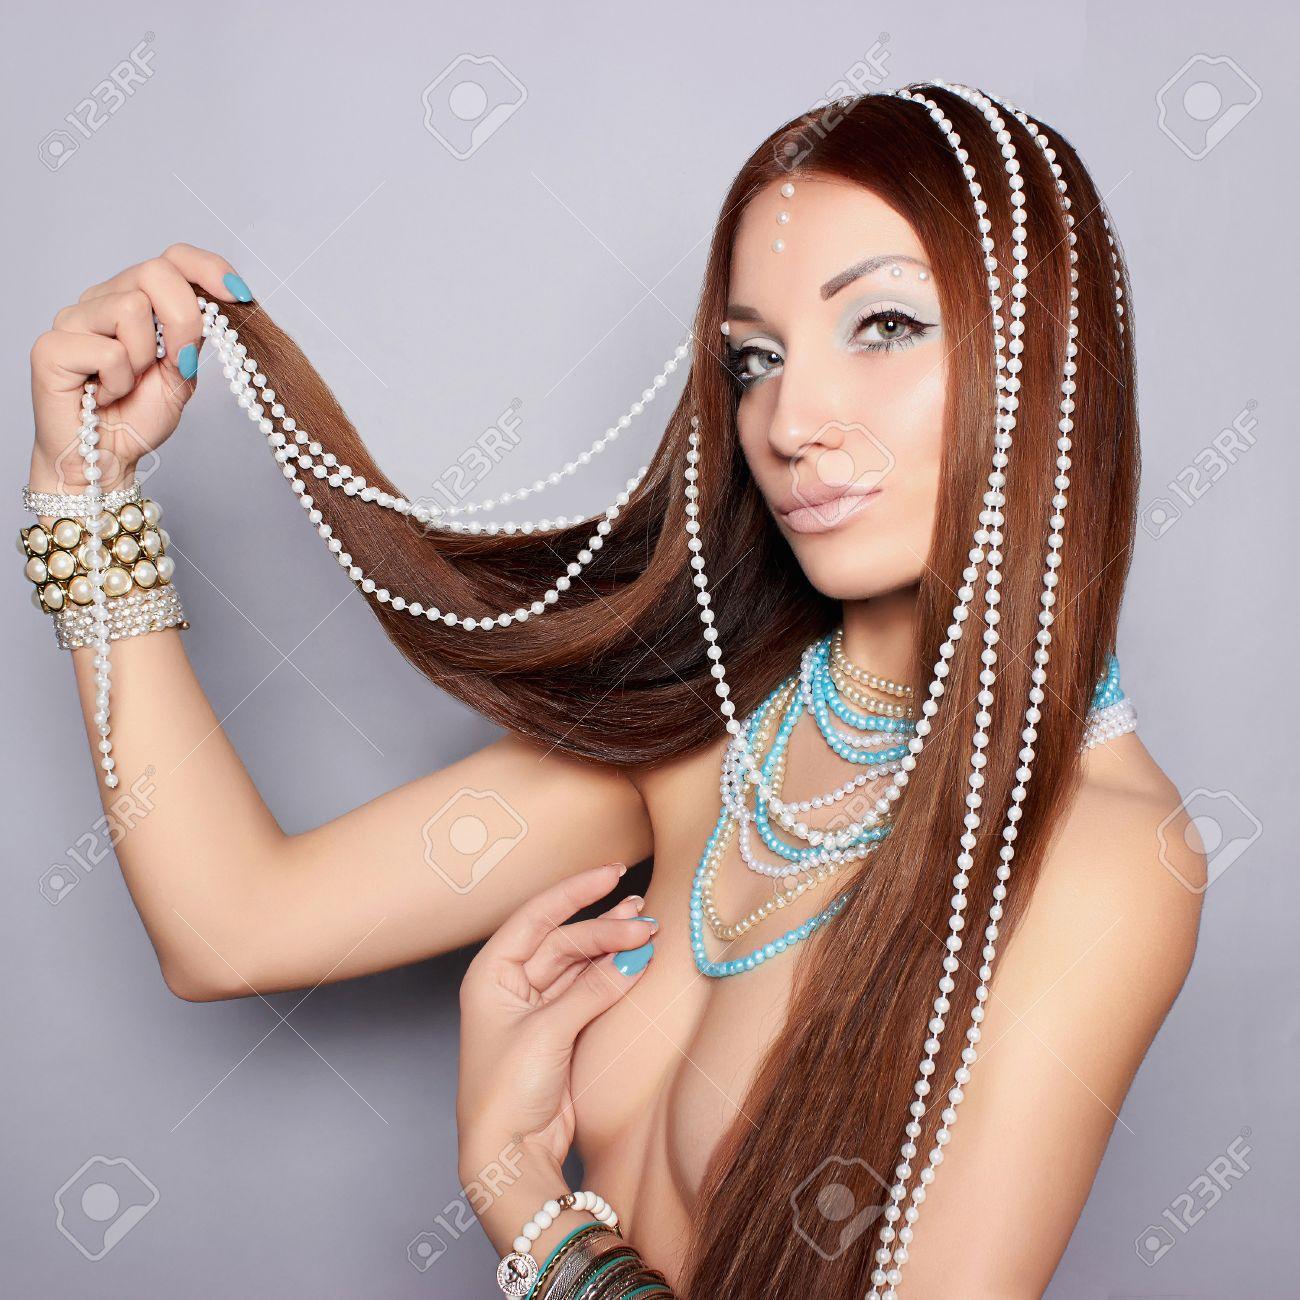 Nicole coco austin nude anal